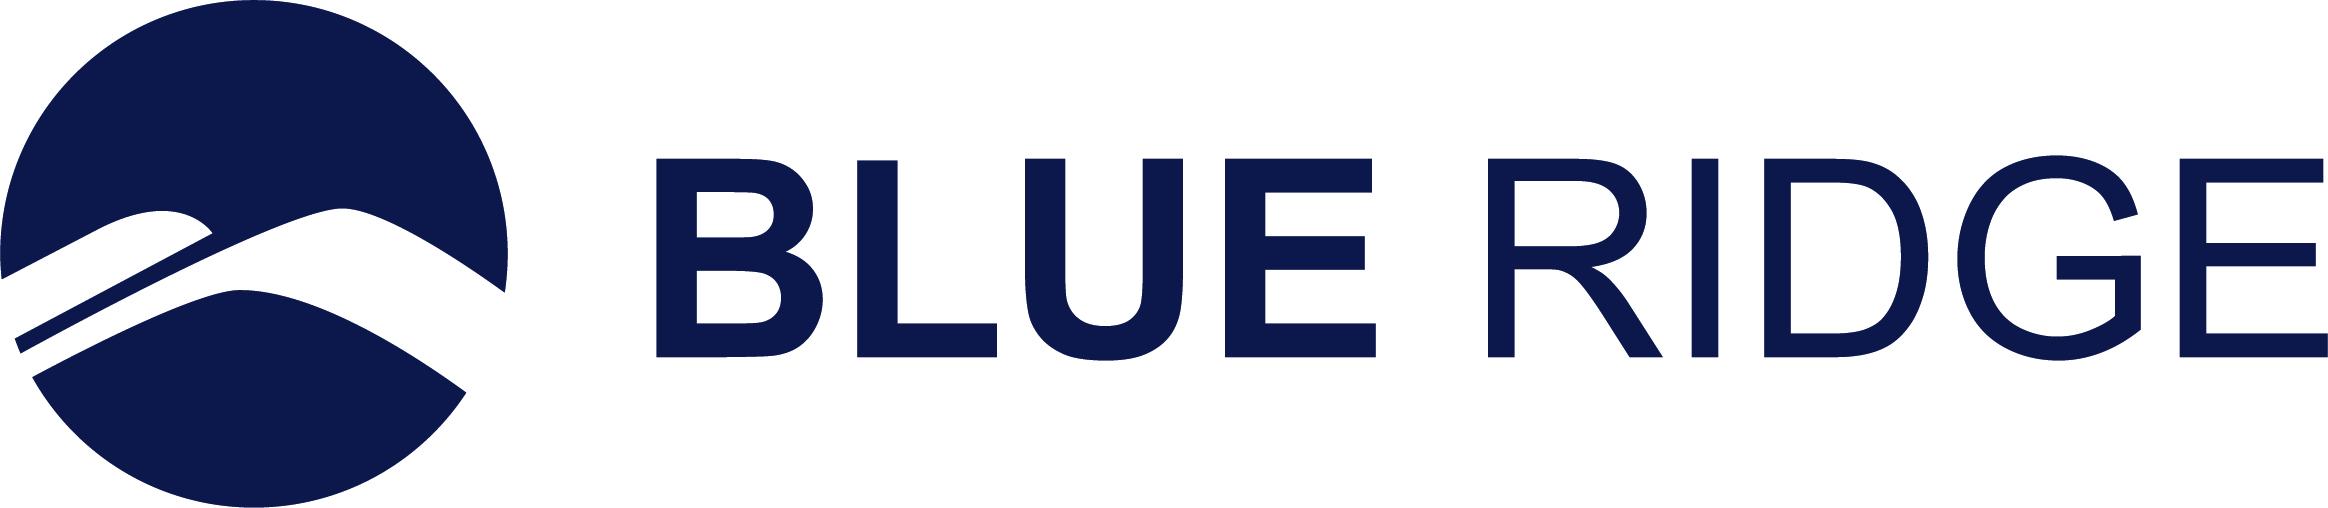 Rajesh Veliyanallore and Santhosh Srirambhatla of Blue Ridge Speak About AI and Machine Learning at BLUEPRINT Conference